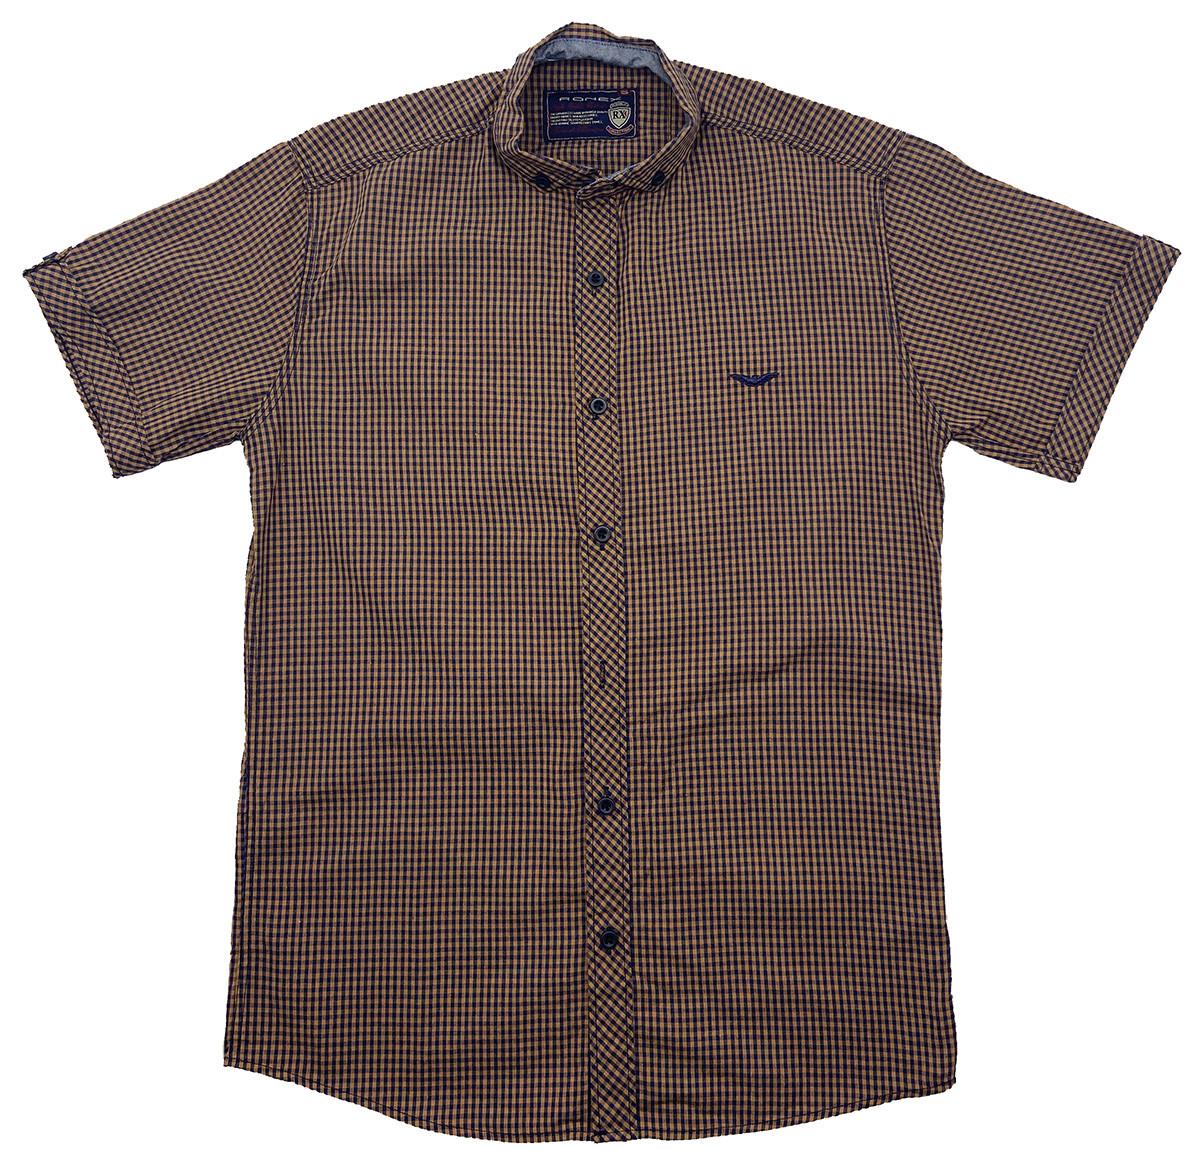 Рубашка с коротким рукавом Ronex Турция kr1008/3 Коричневая XXL